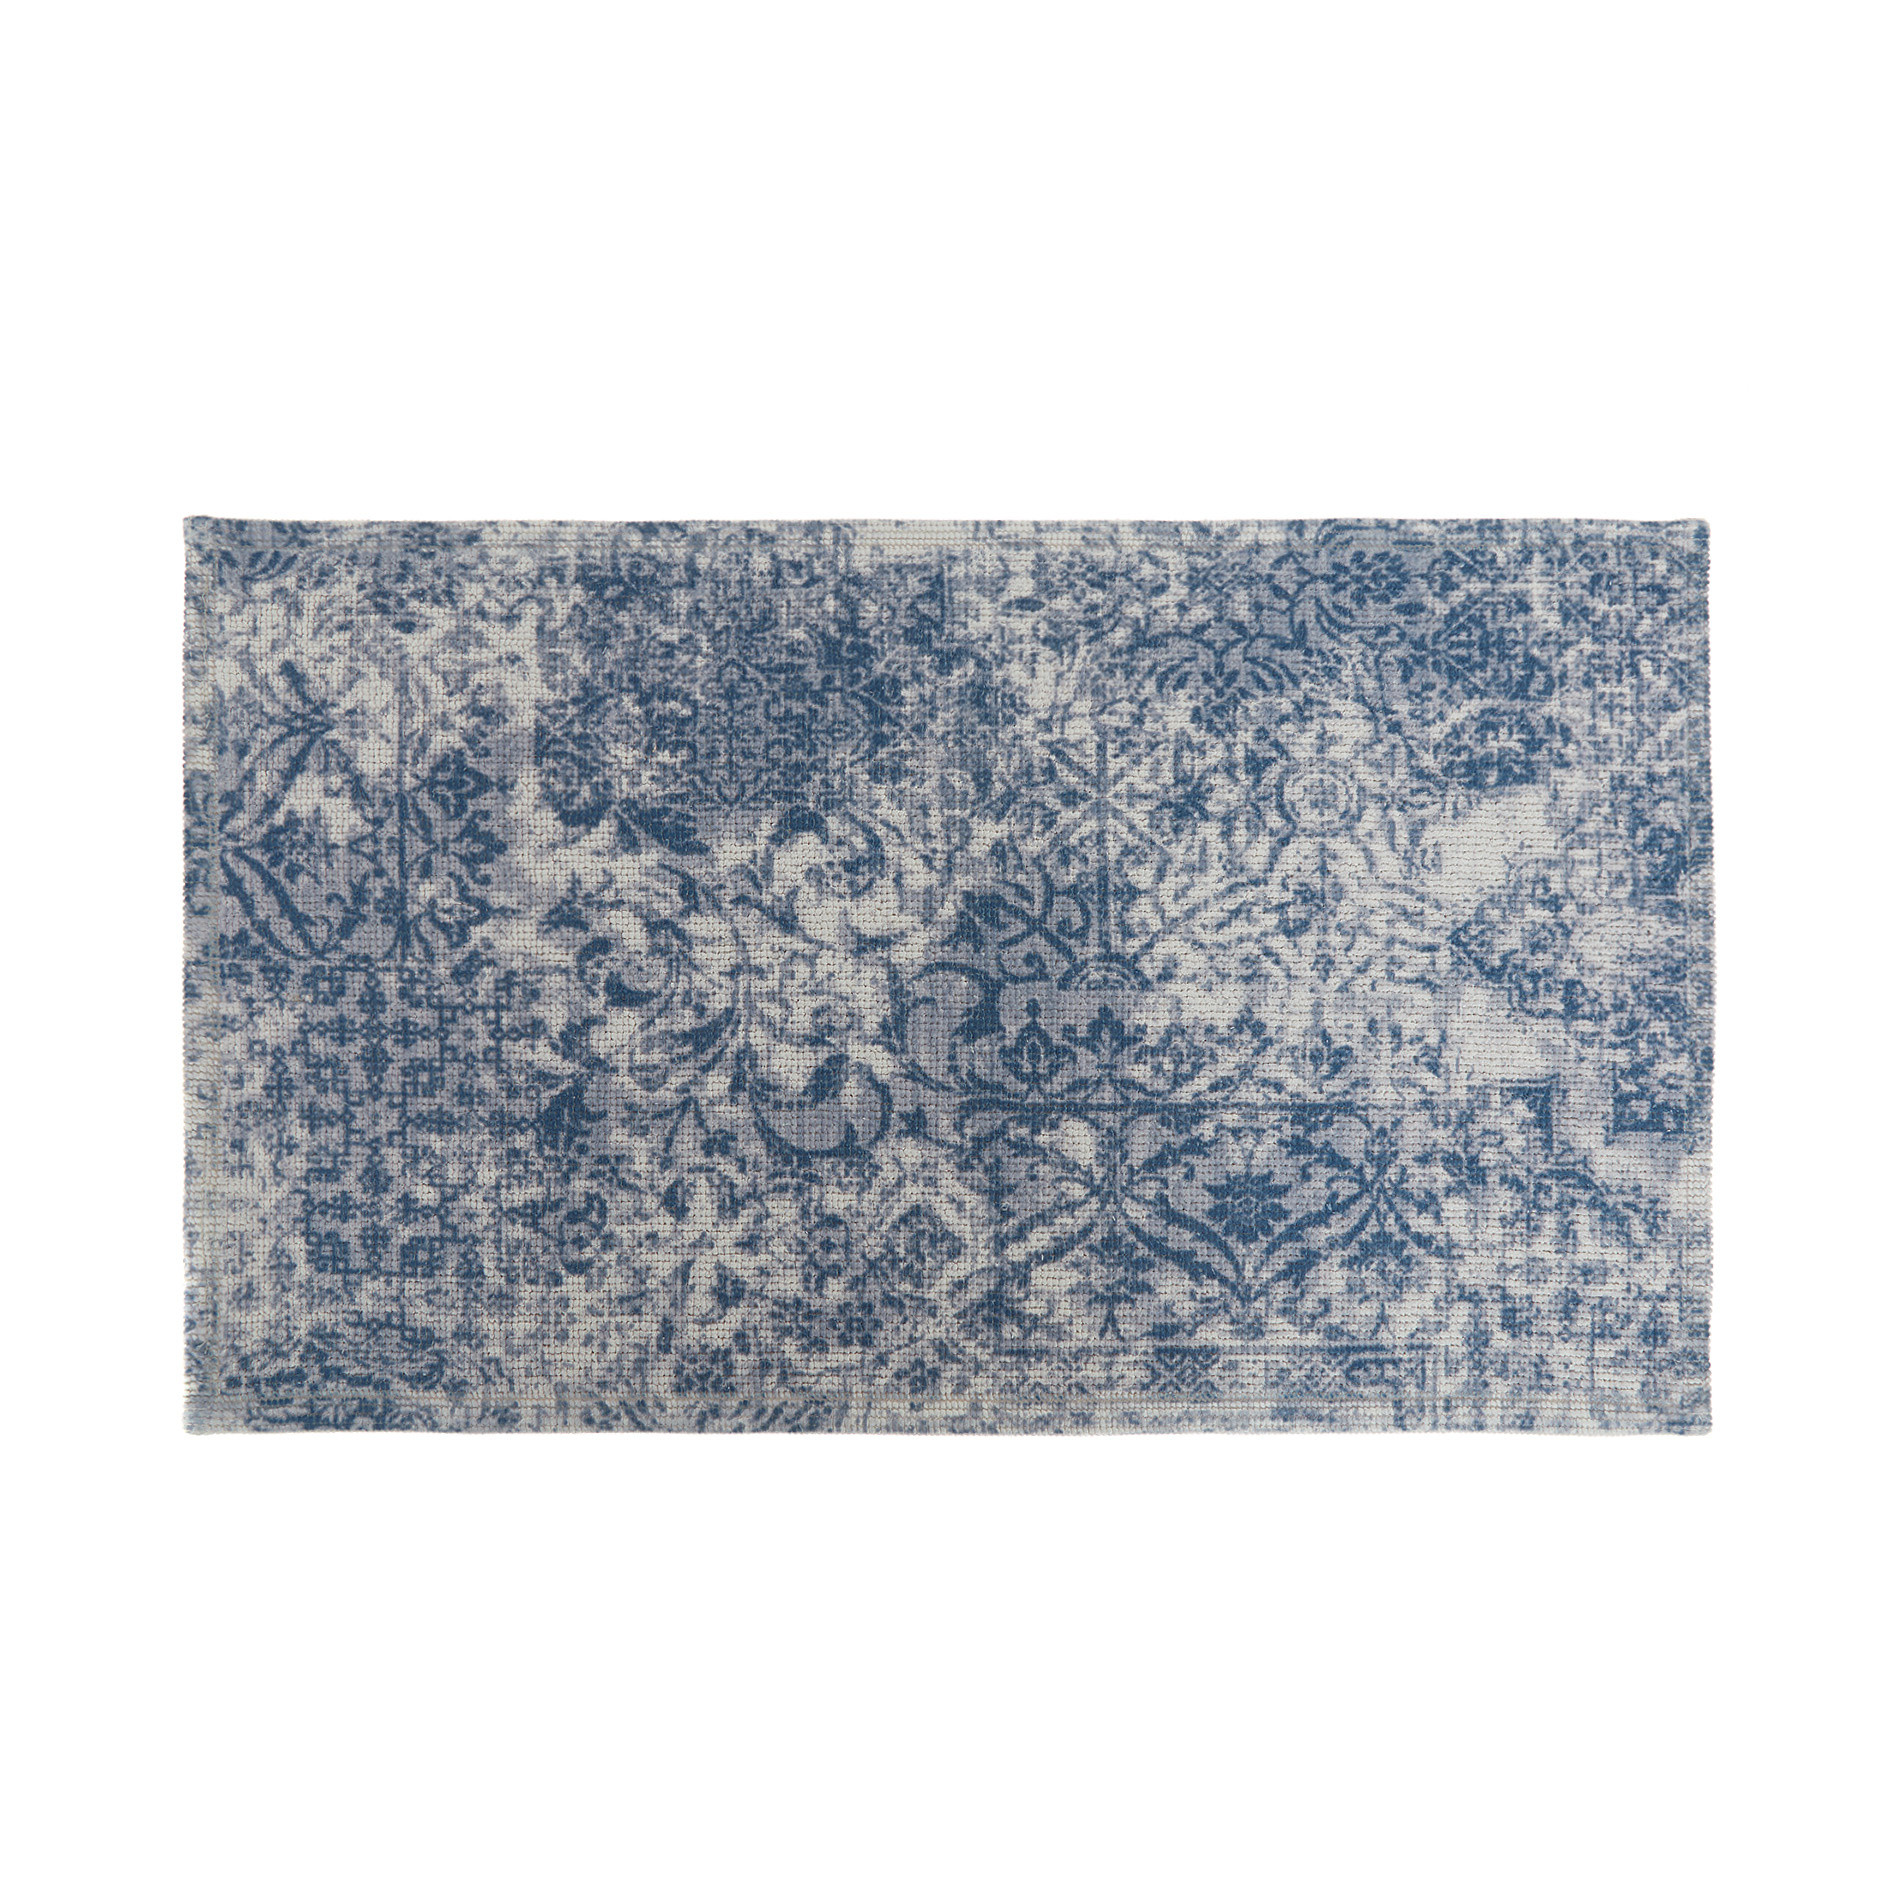 Tappeto bagno misto cotone effetto kilim, Blu, large image number 0